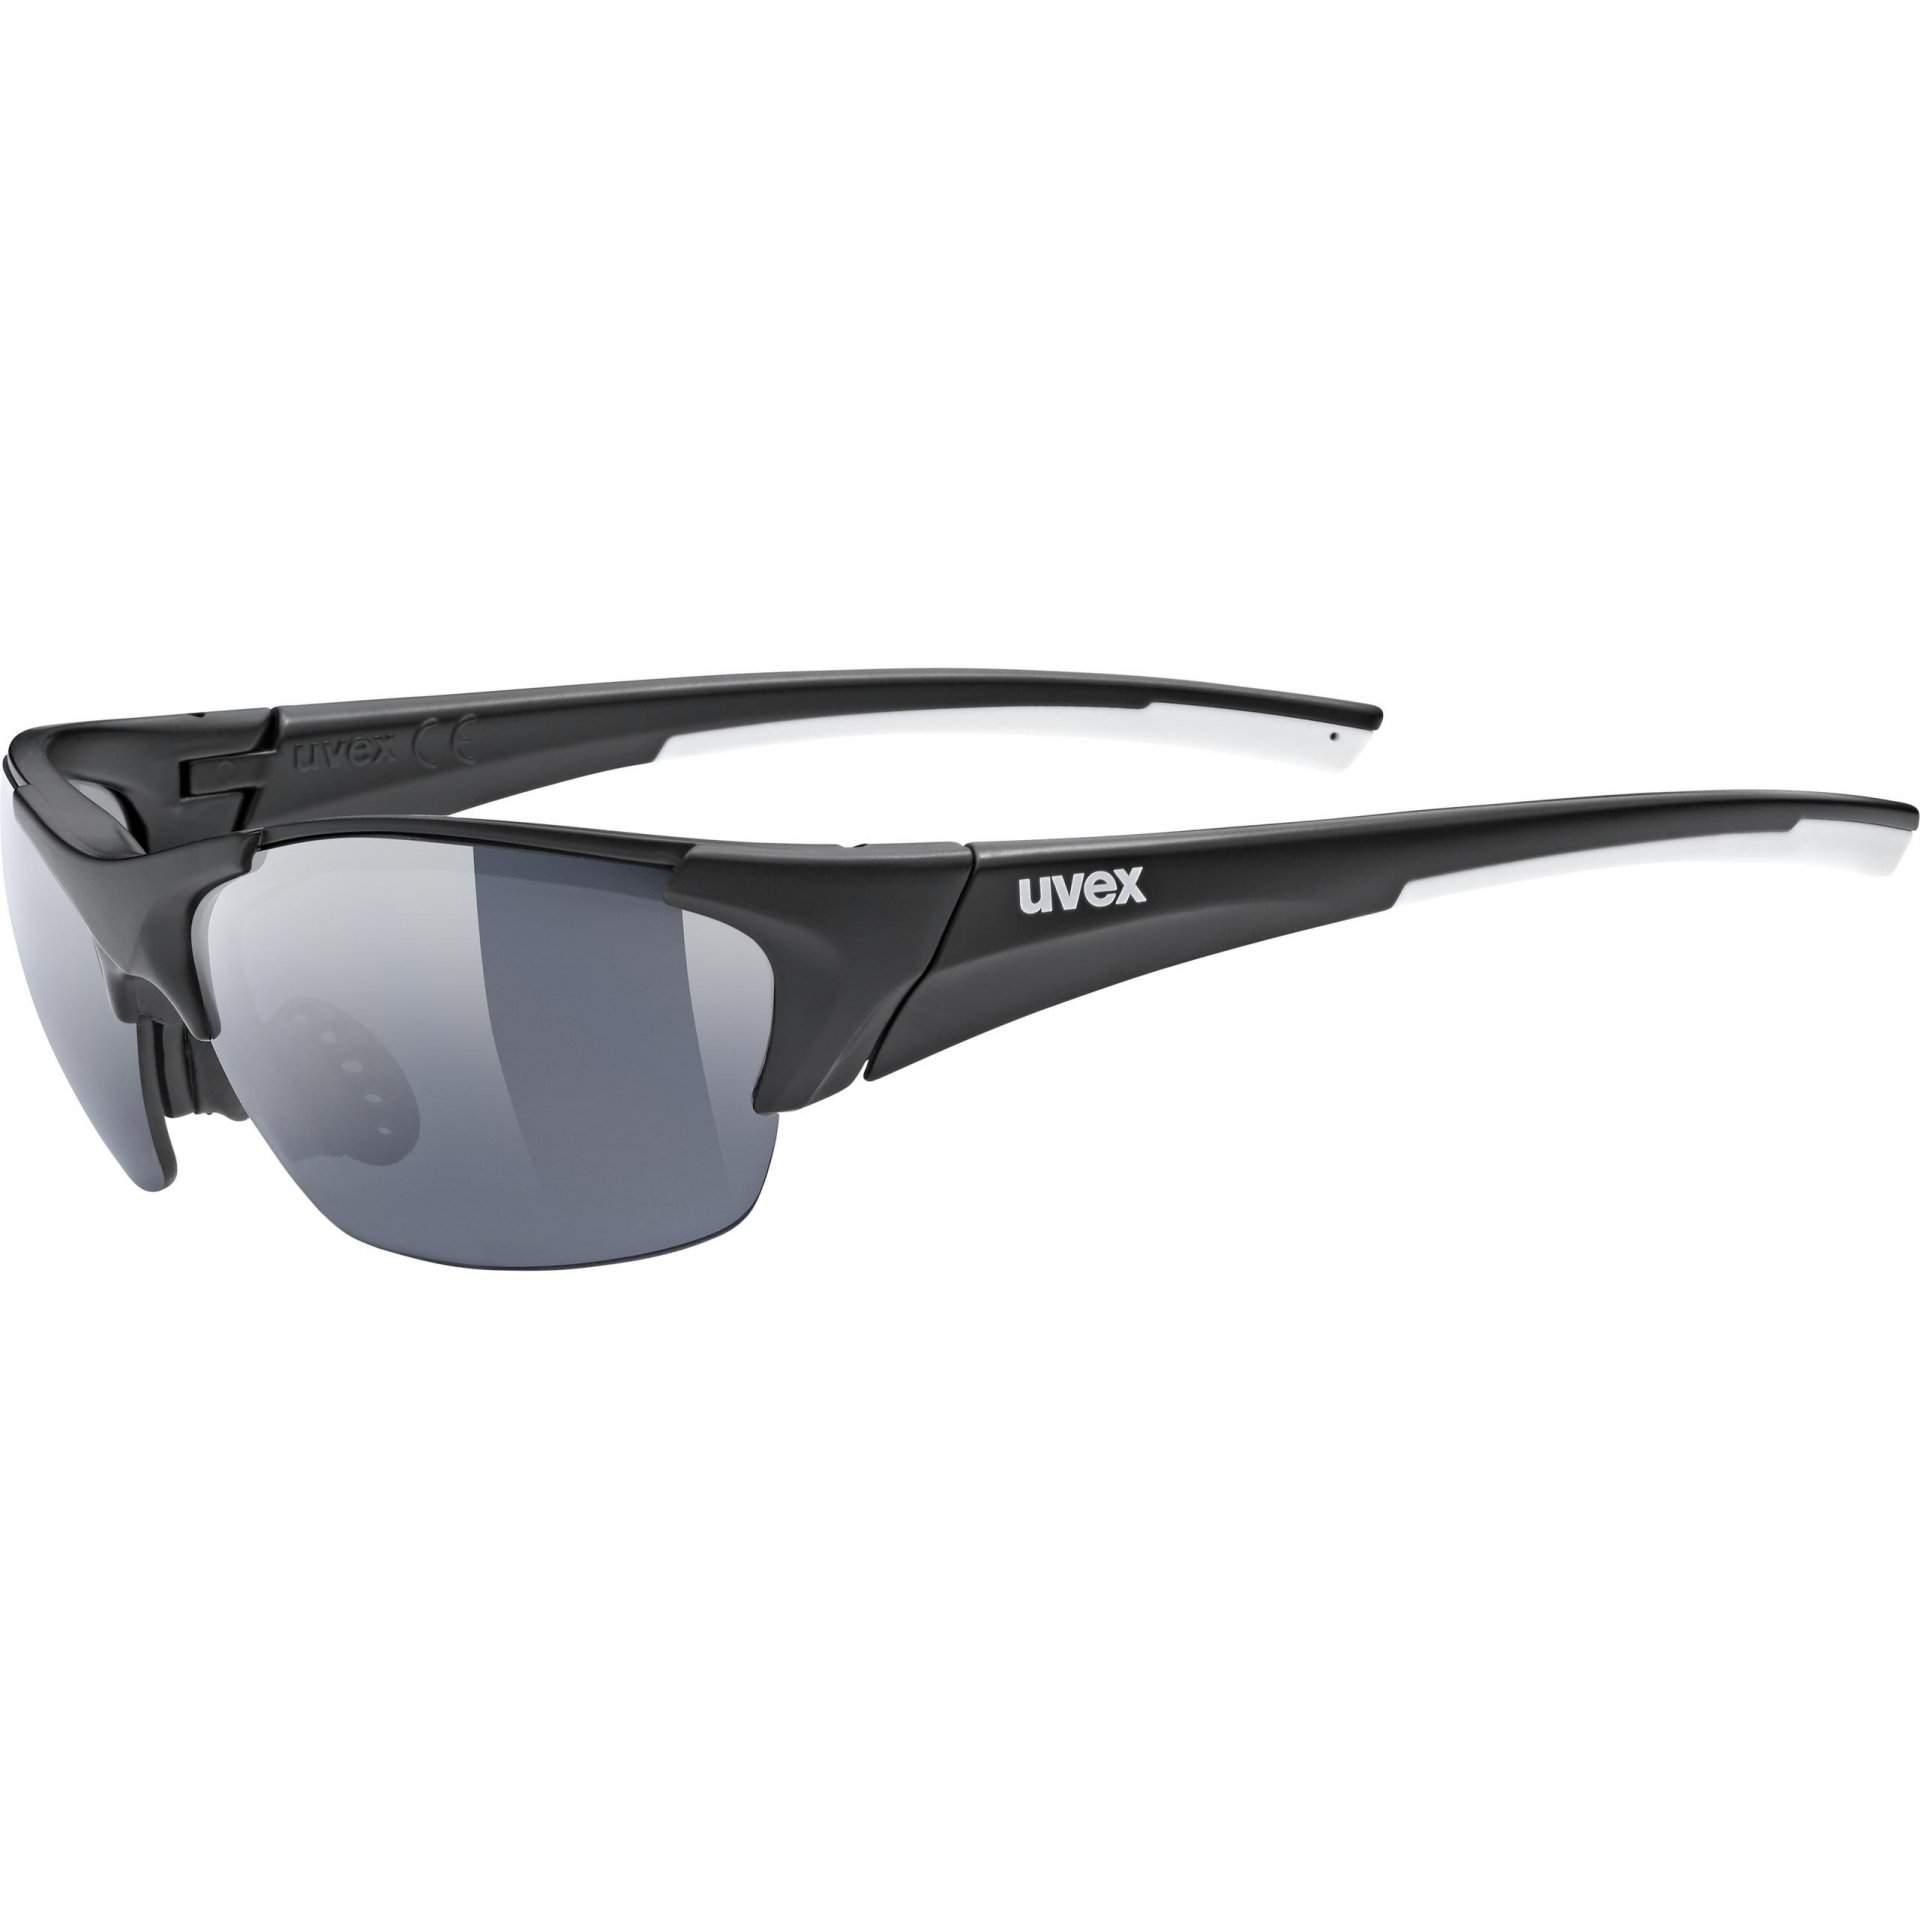 OKULARY UVEX BLAZE III 53|2|046|2210 BLACK MAT